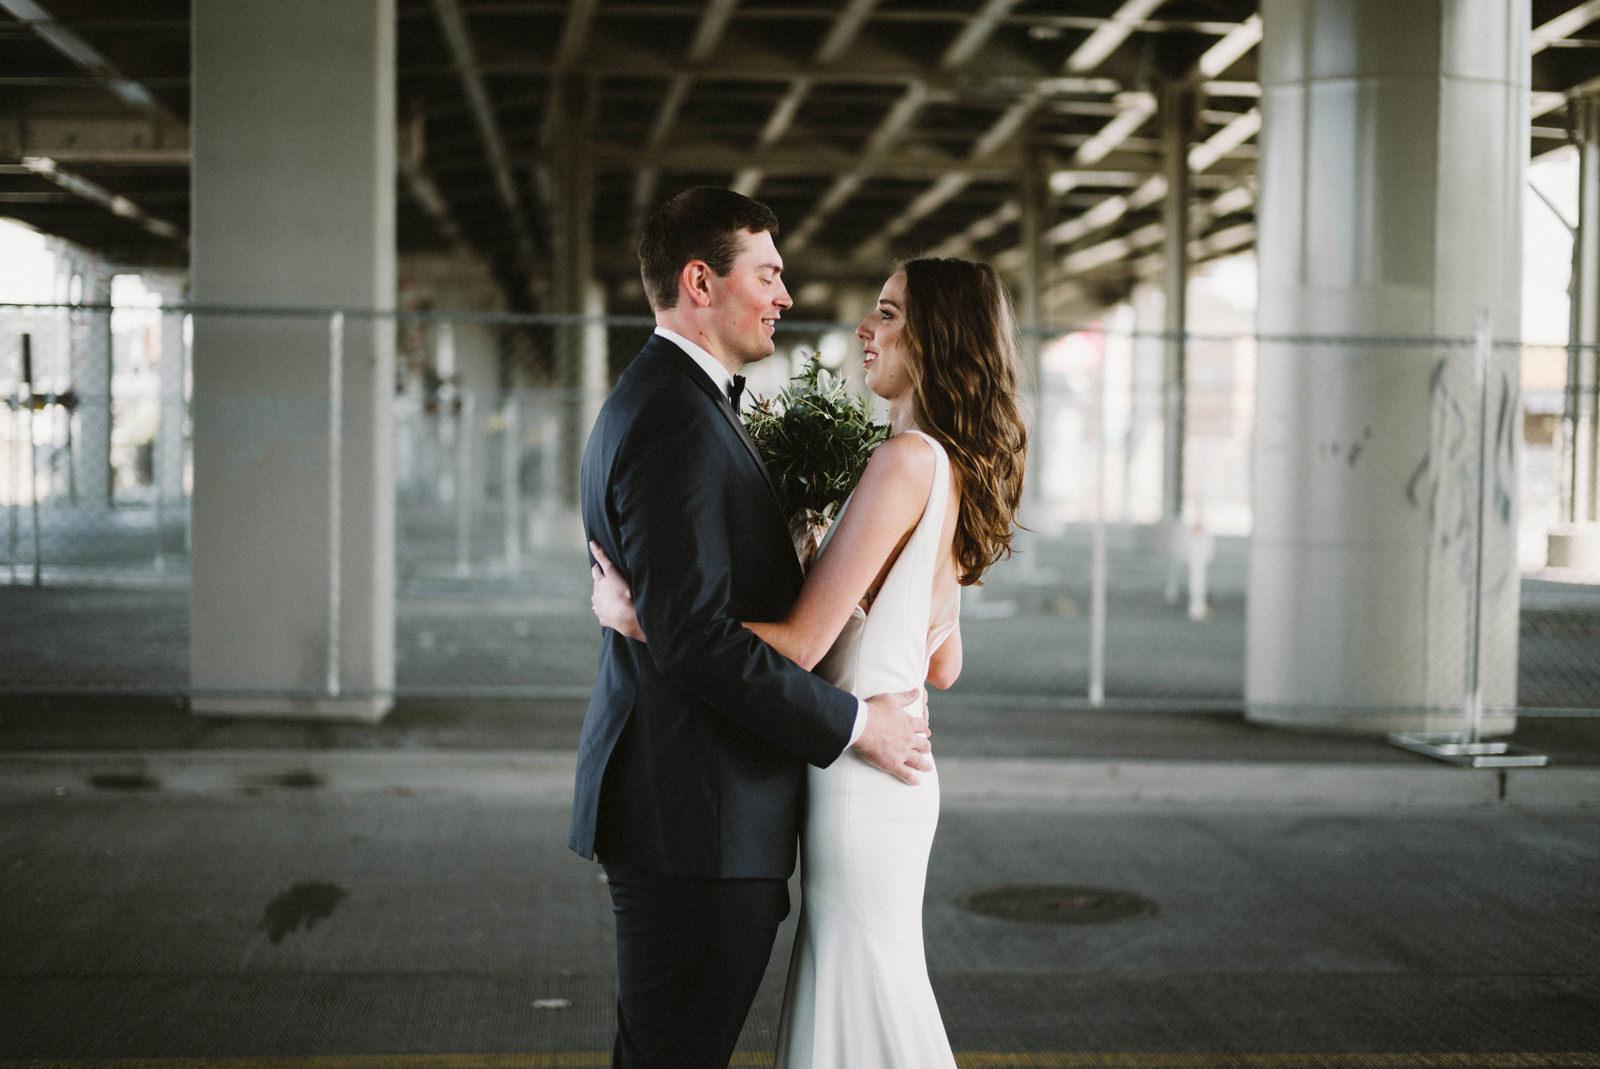 sodo-park-wedding-015 SODO PARK WEDDING